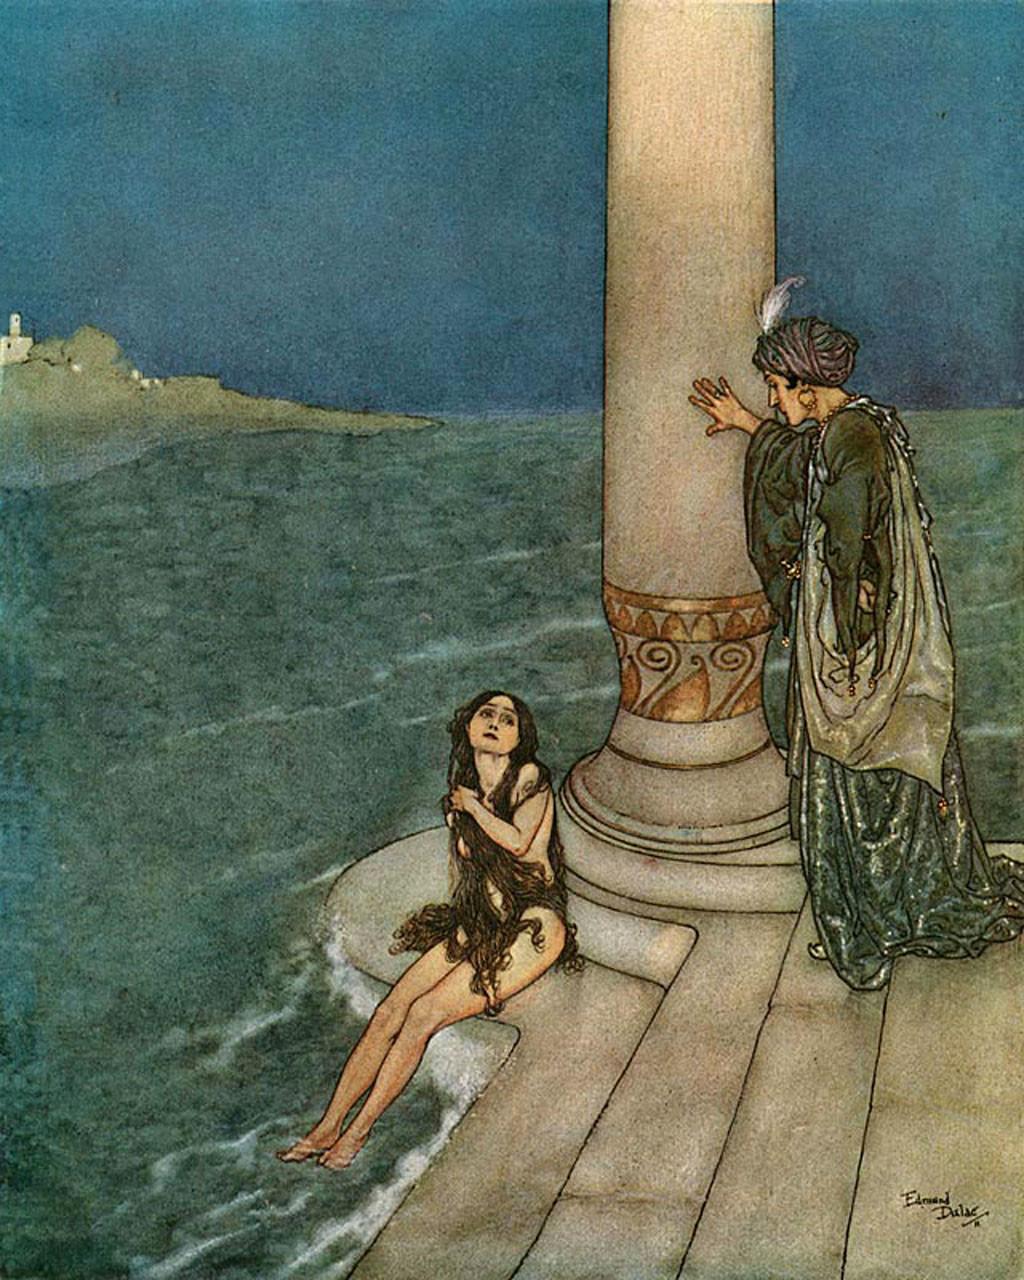 The-Little-Mermaid-Fairy-Tale.jpg